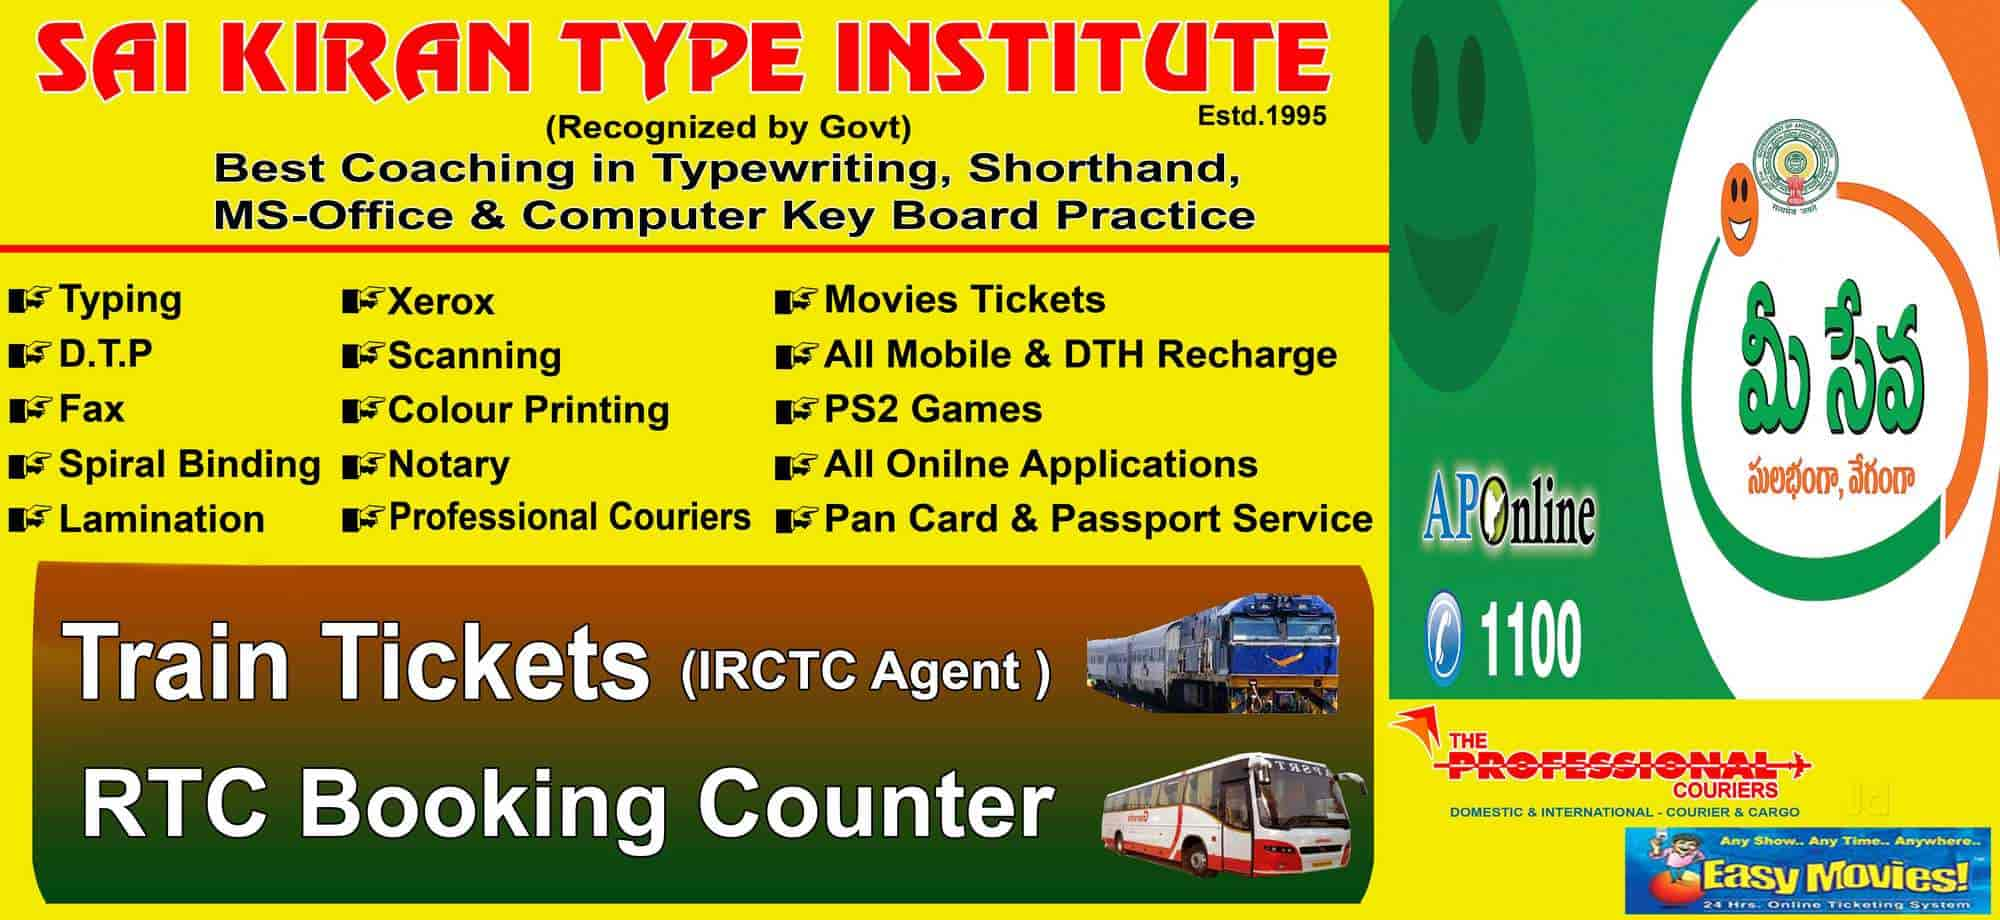 Top 100 Data Entry Jobs In As Rao Nagar Best Part Time Data